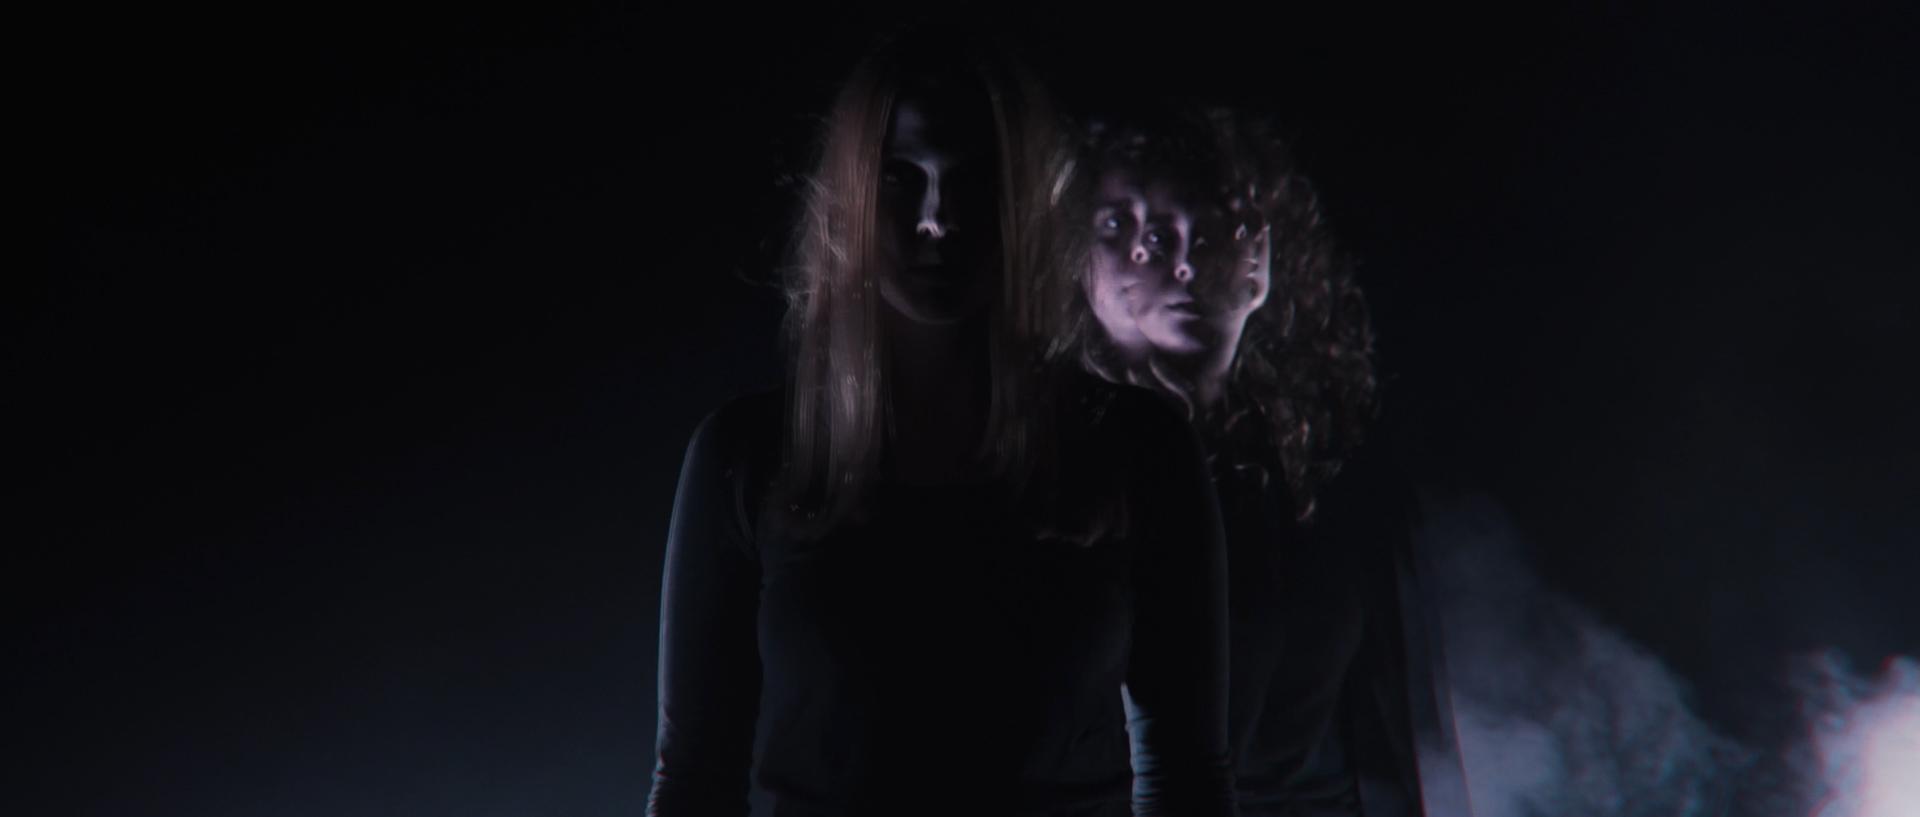 Two girls standing in smoke